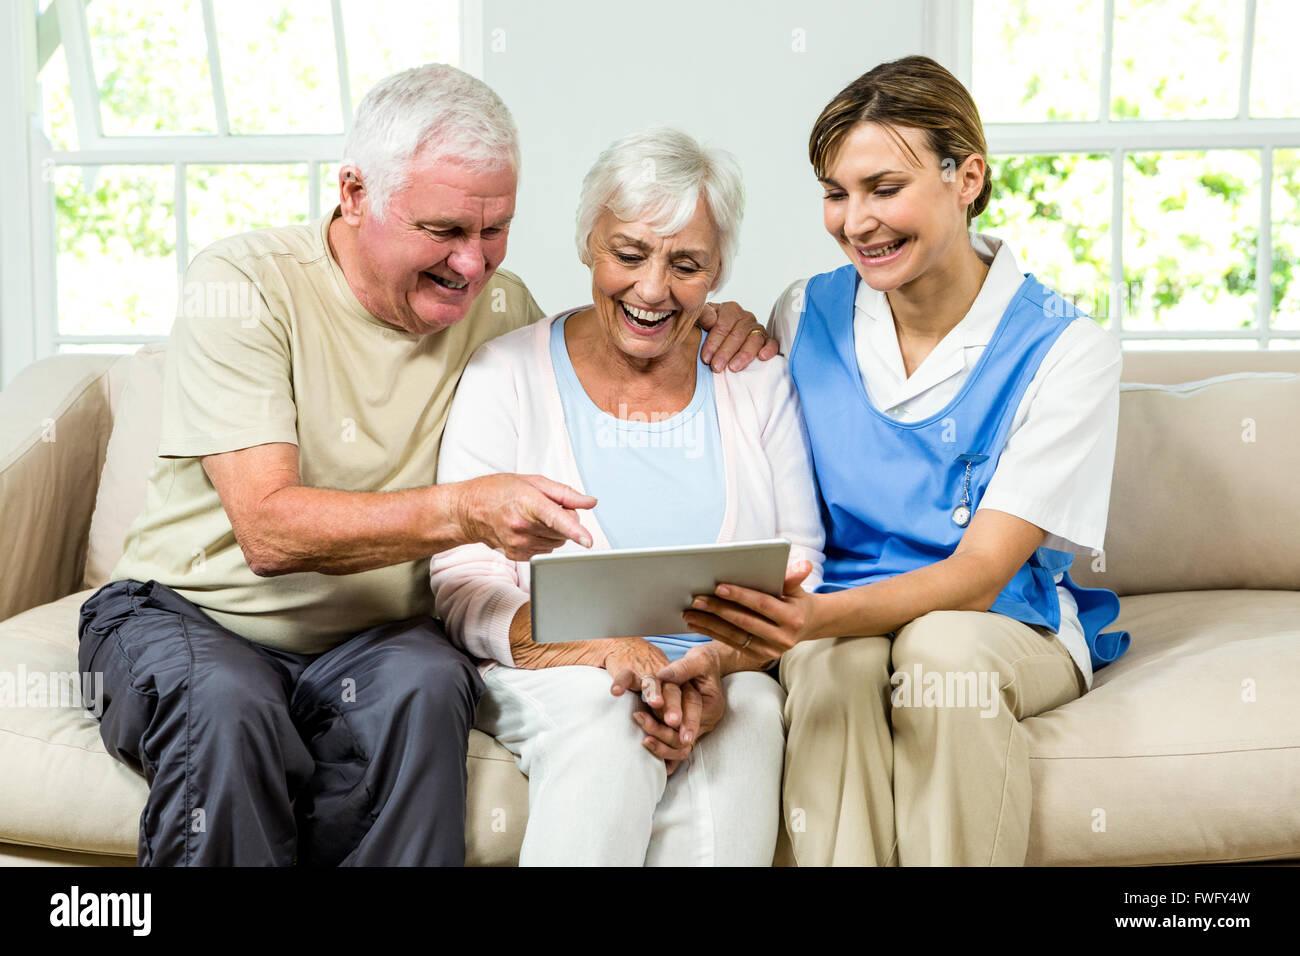 Happy nurse and senior adults holding digital tablet - Stock Image